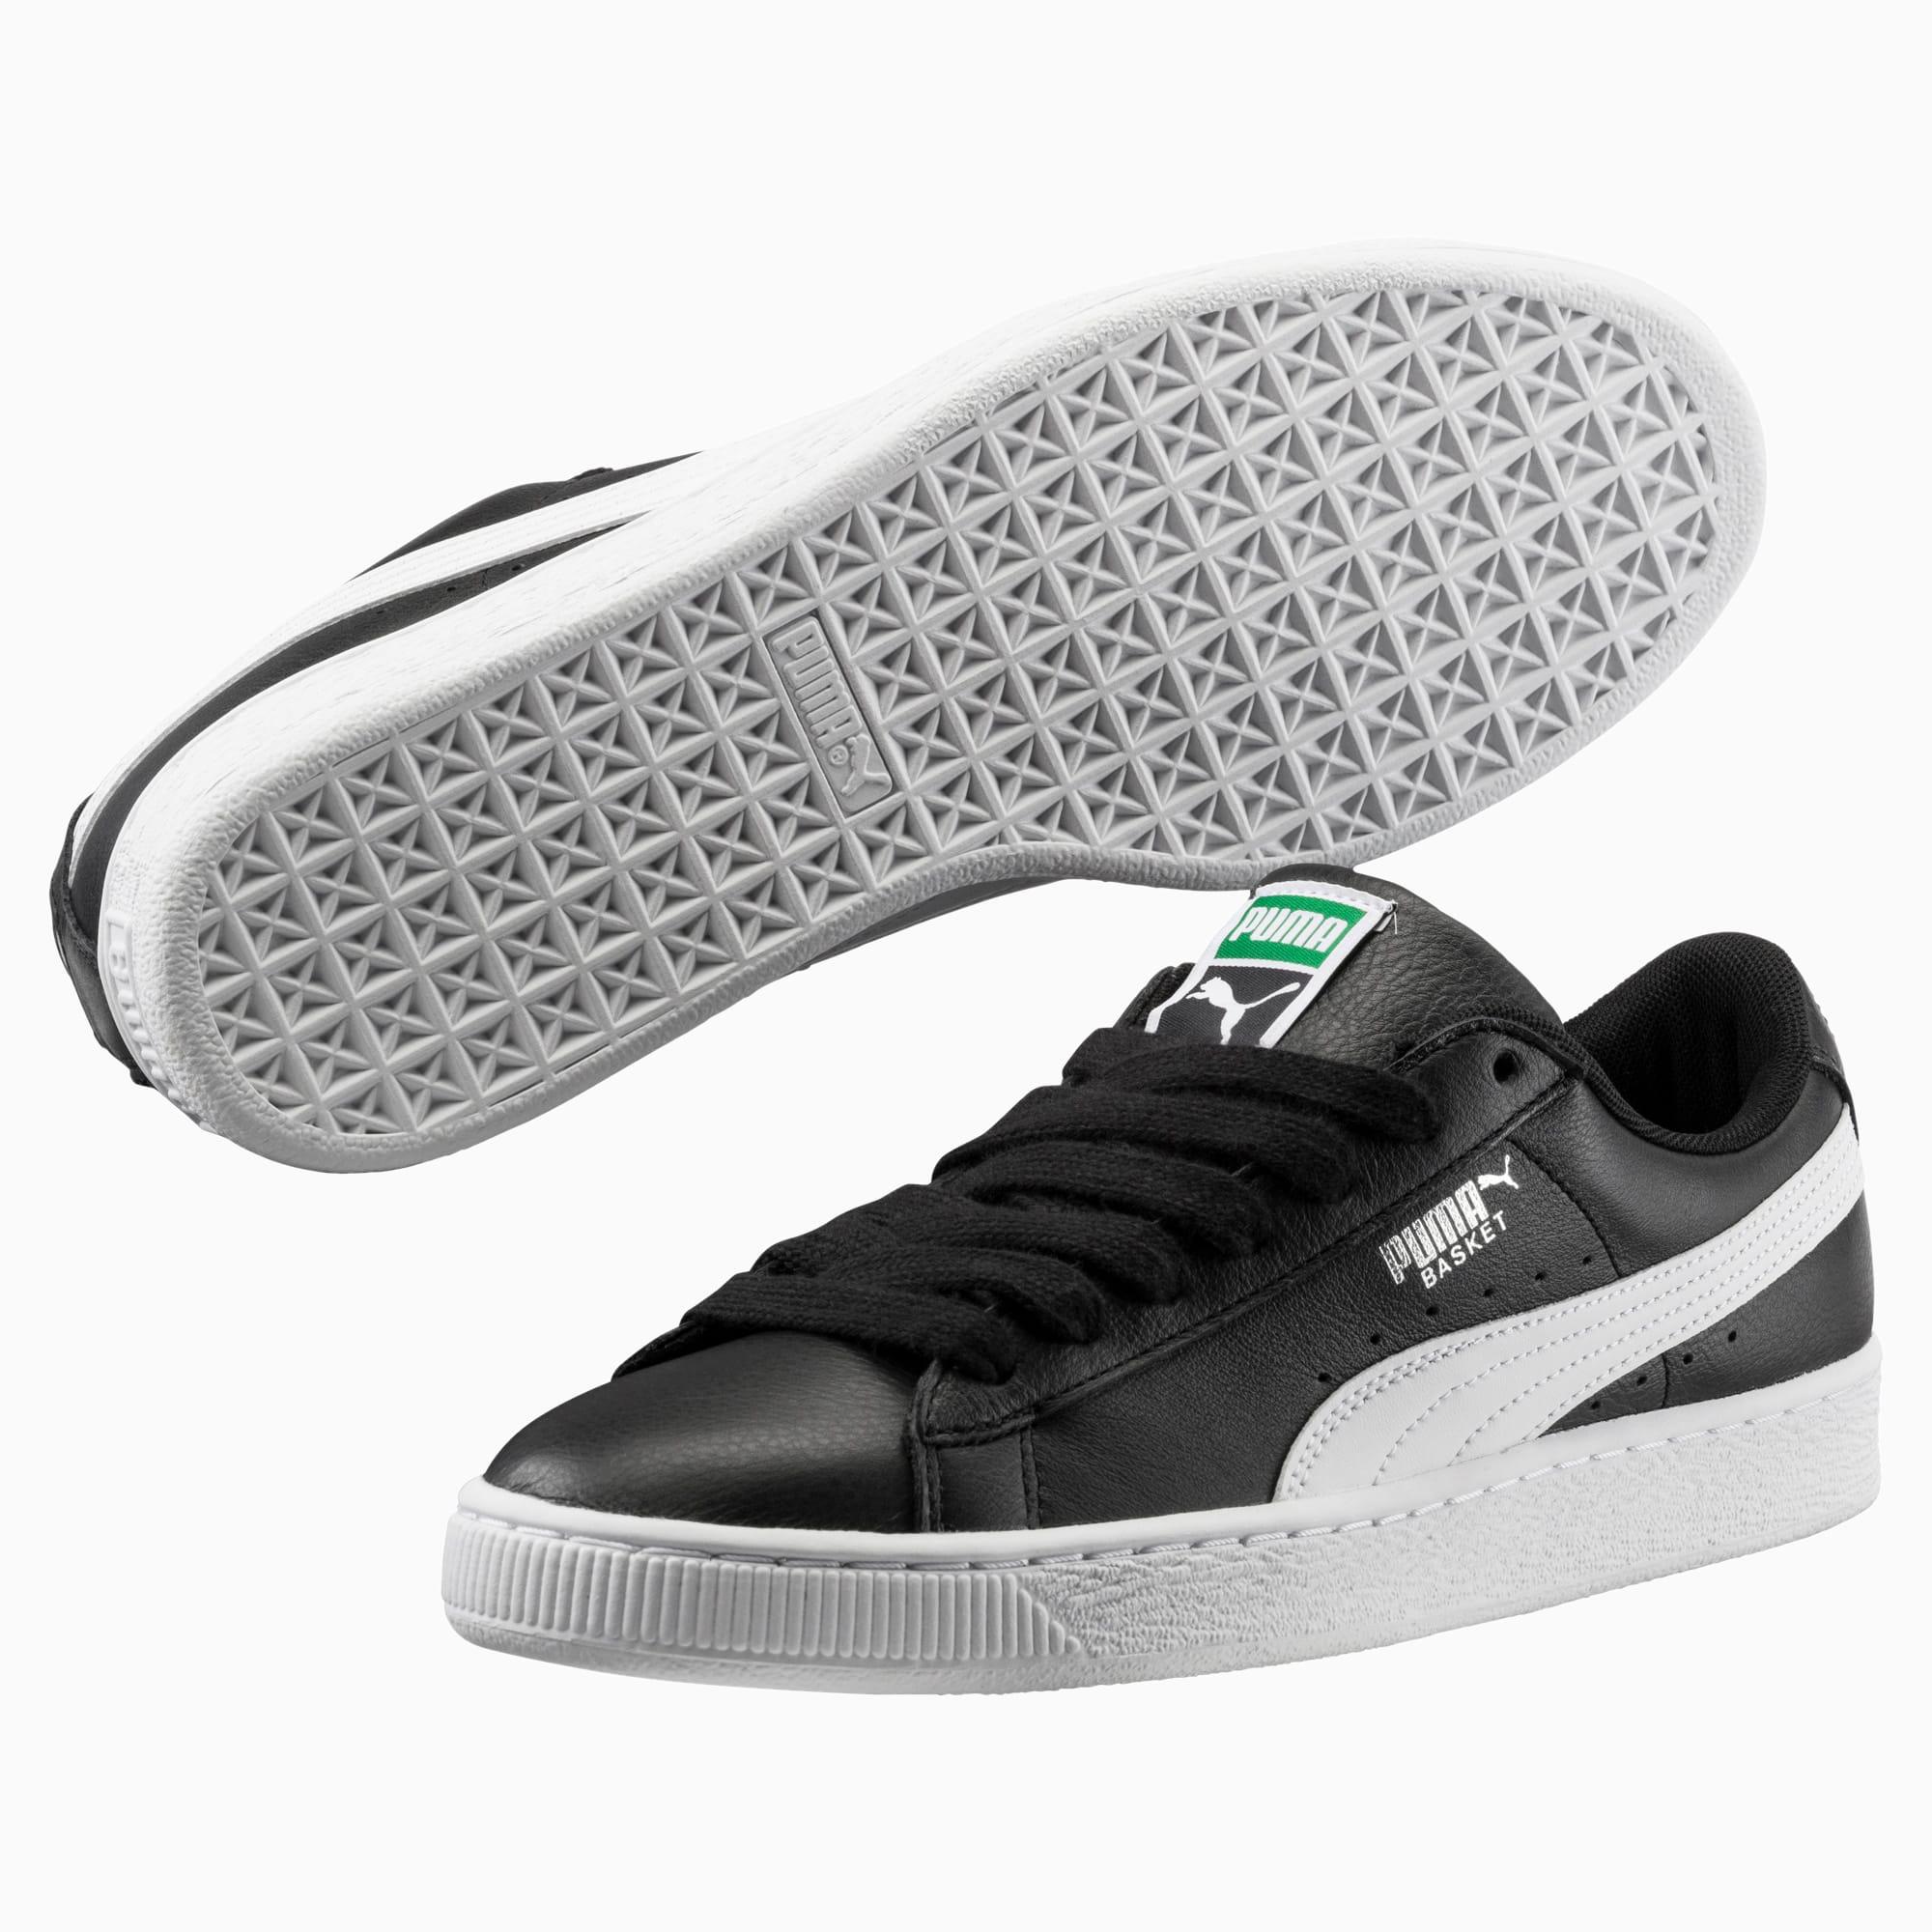 Heritage Basket Classic Sneaker | black white | PUMA COTY